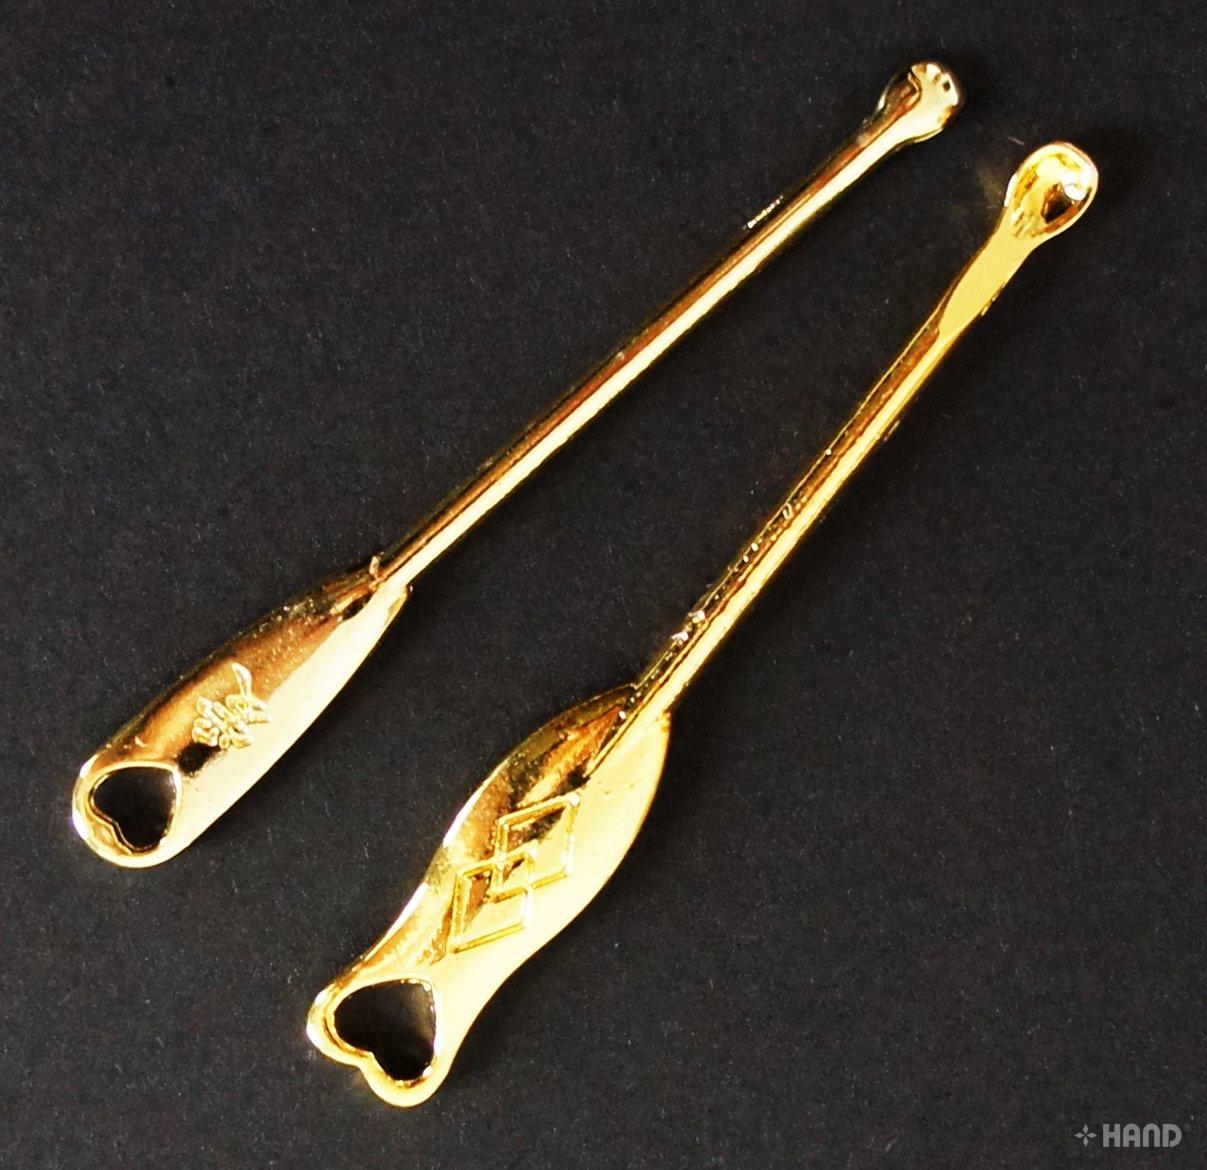 09 Earpick Metal Ear Wax Remover Cleaner - Buy 1 Get 1 FREE! (Gold) XMD